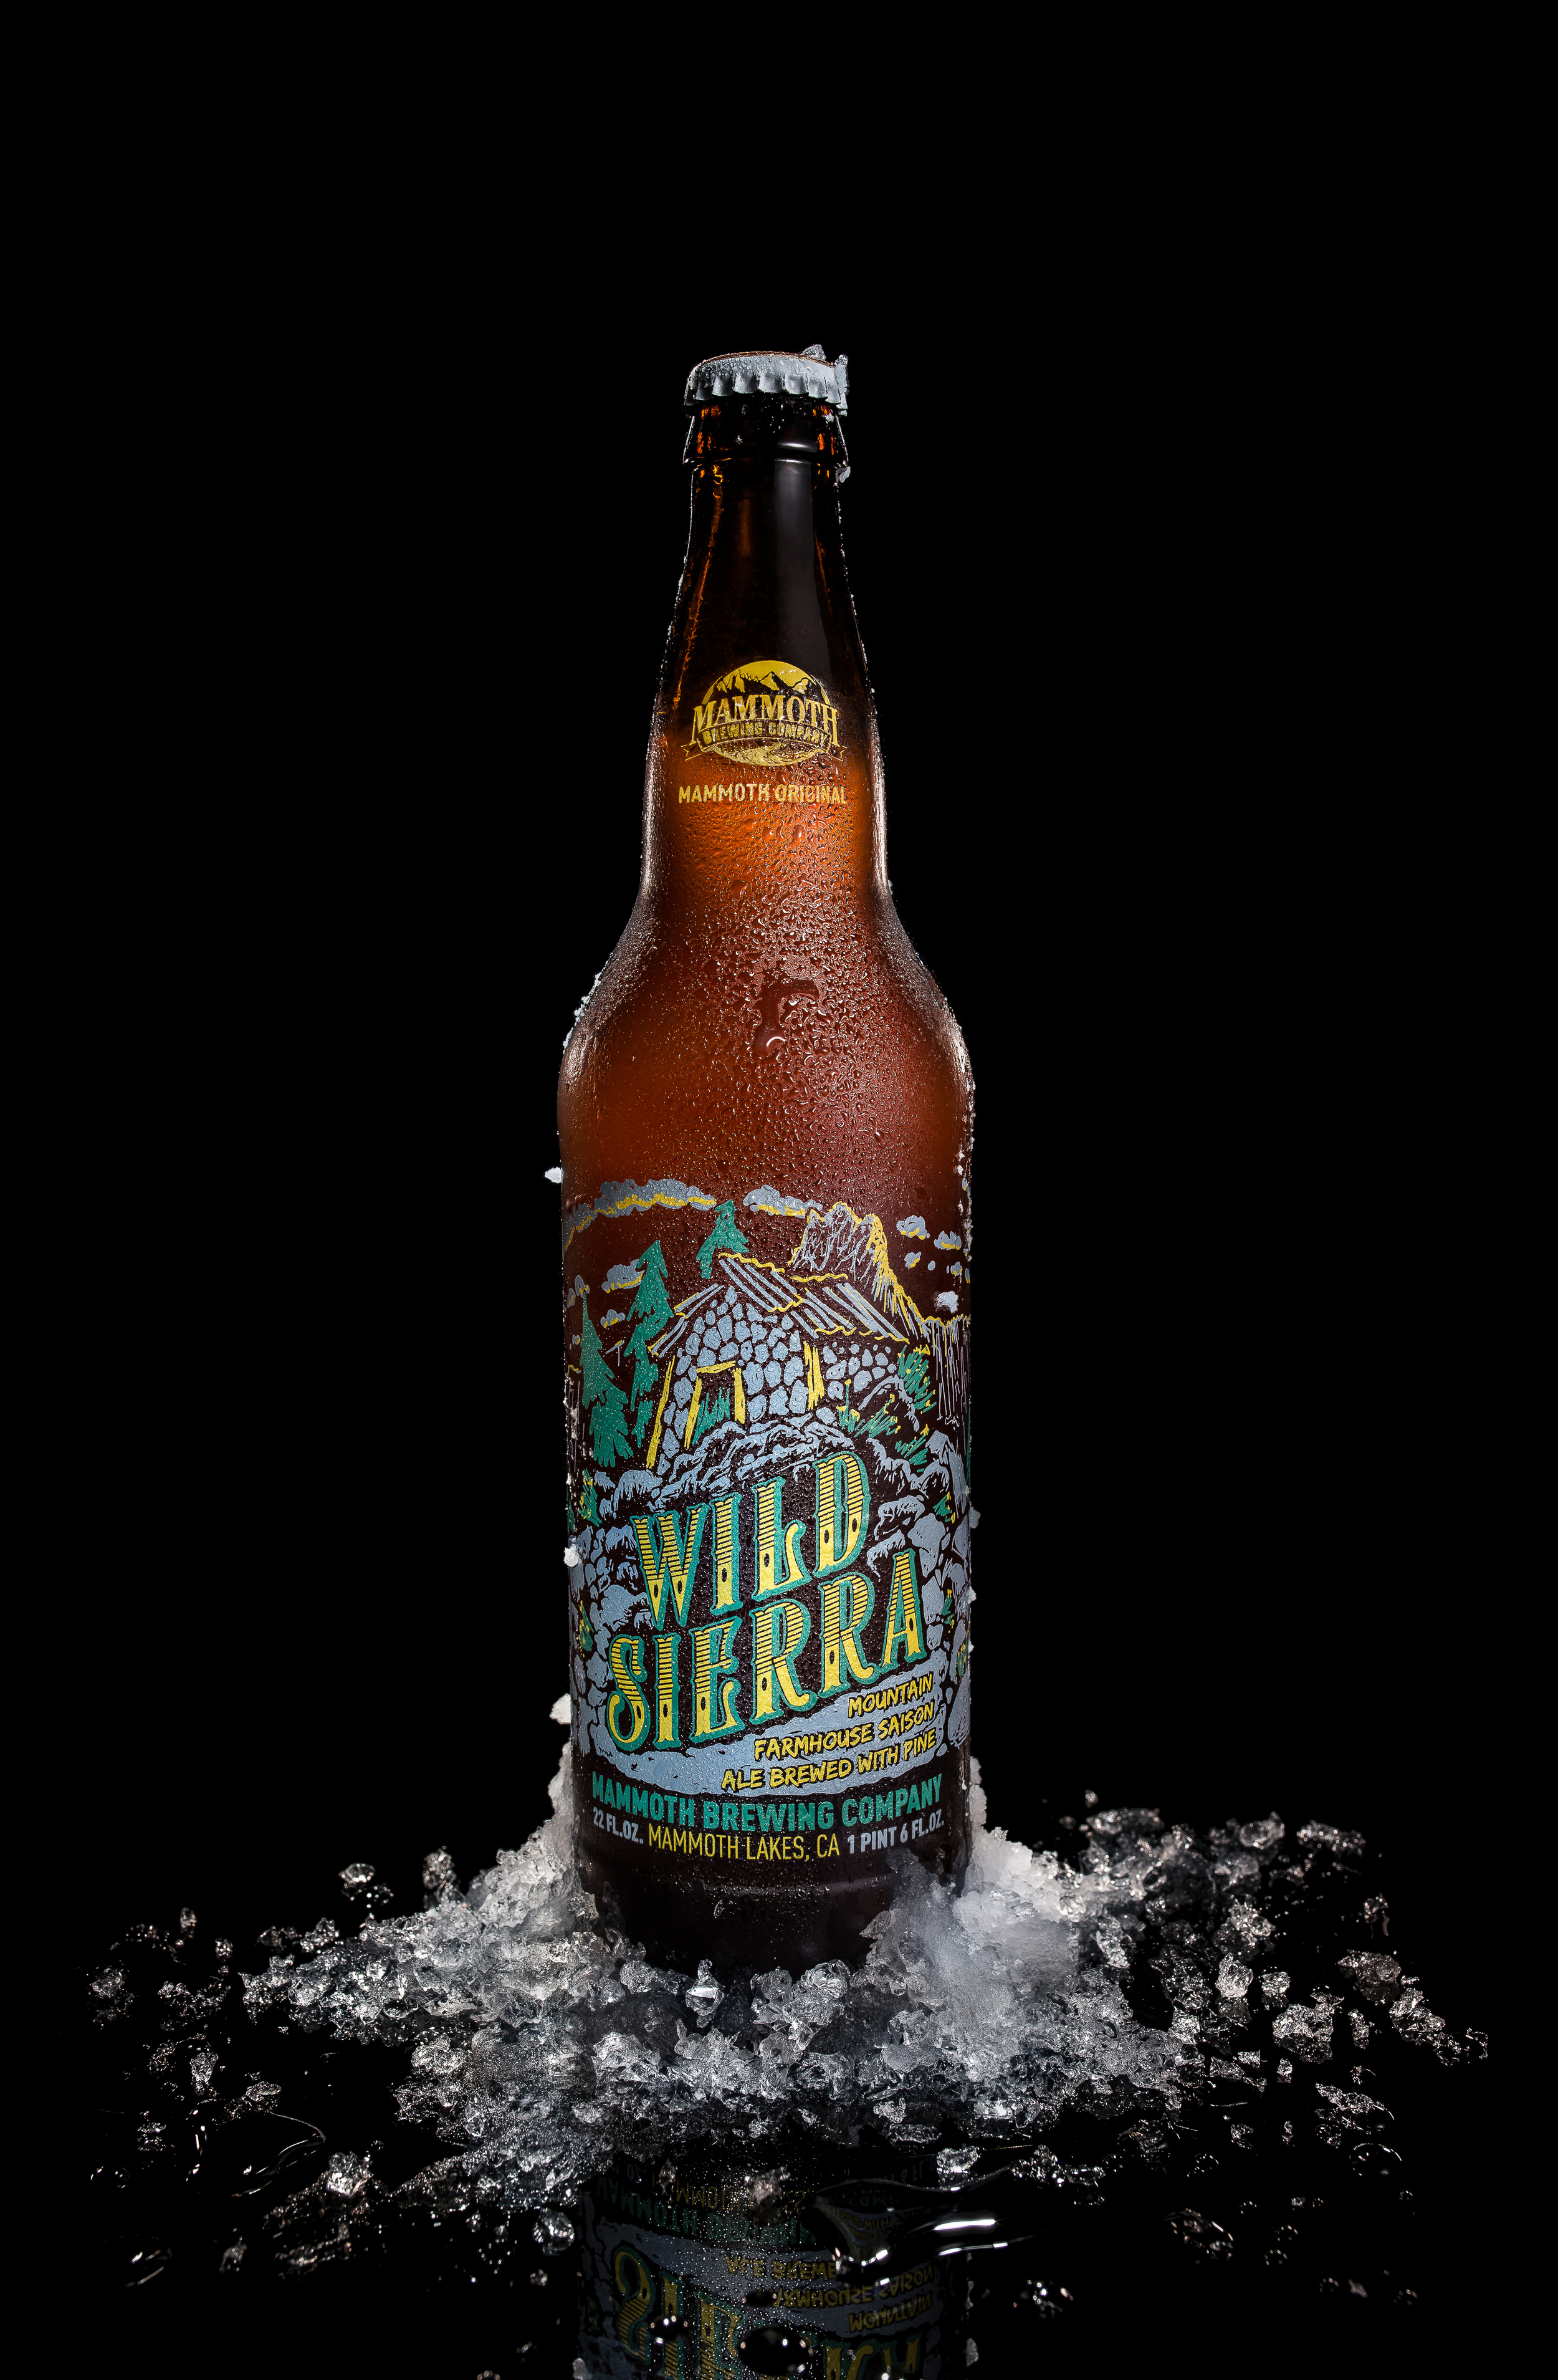 Mammoth-Brewery-Wild-Sierra-Final.jpg